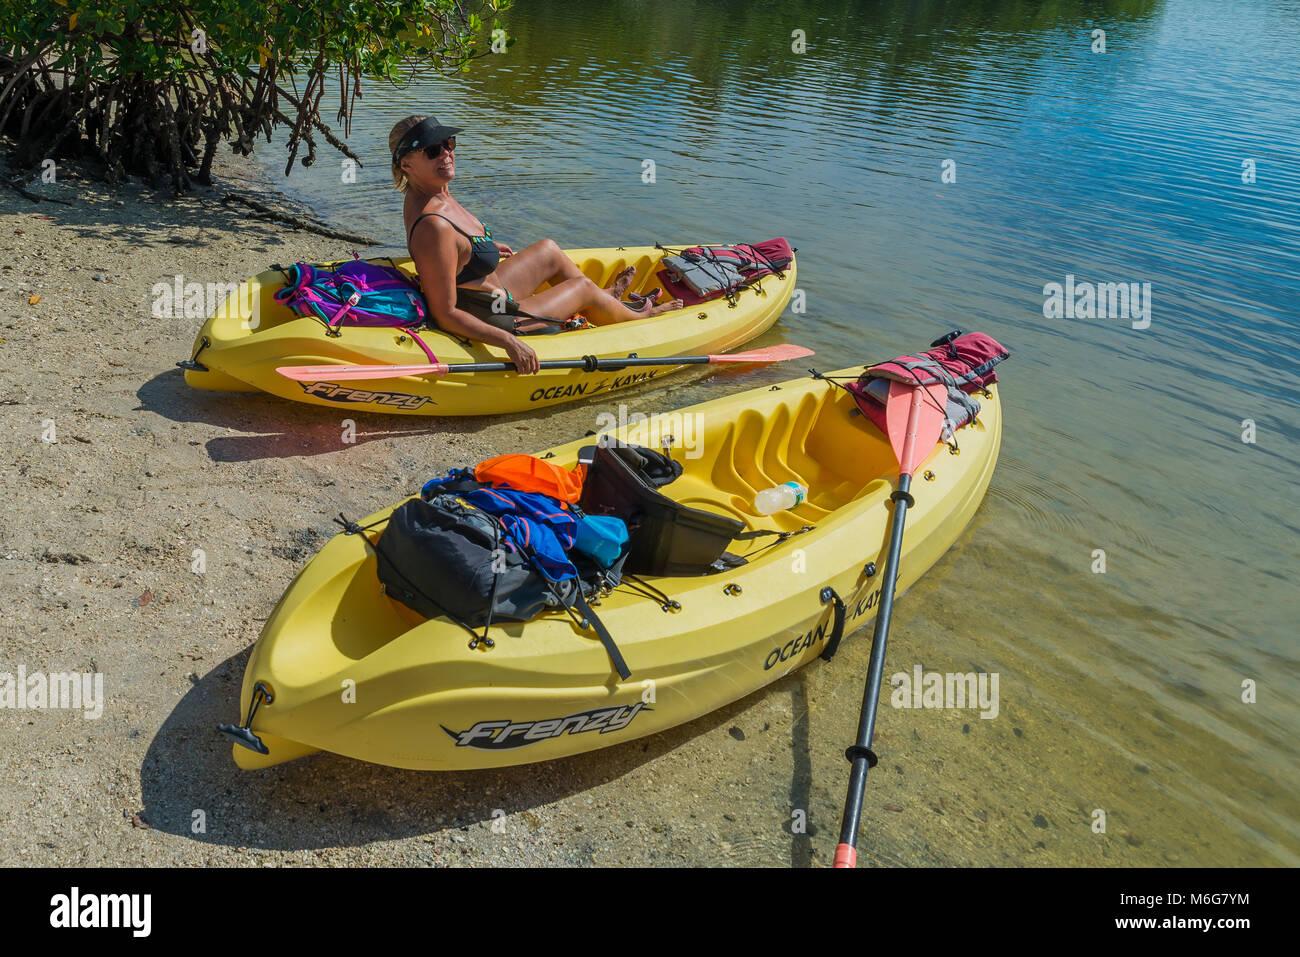 USA, Florida Fort Myers beach, sol, varmt, semester, ledigt, hav, sjö, kajak, plastkajak, båt, paddel,  sjöko, upplevelse, Stock Photo